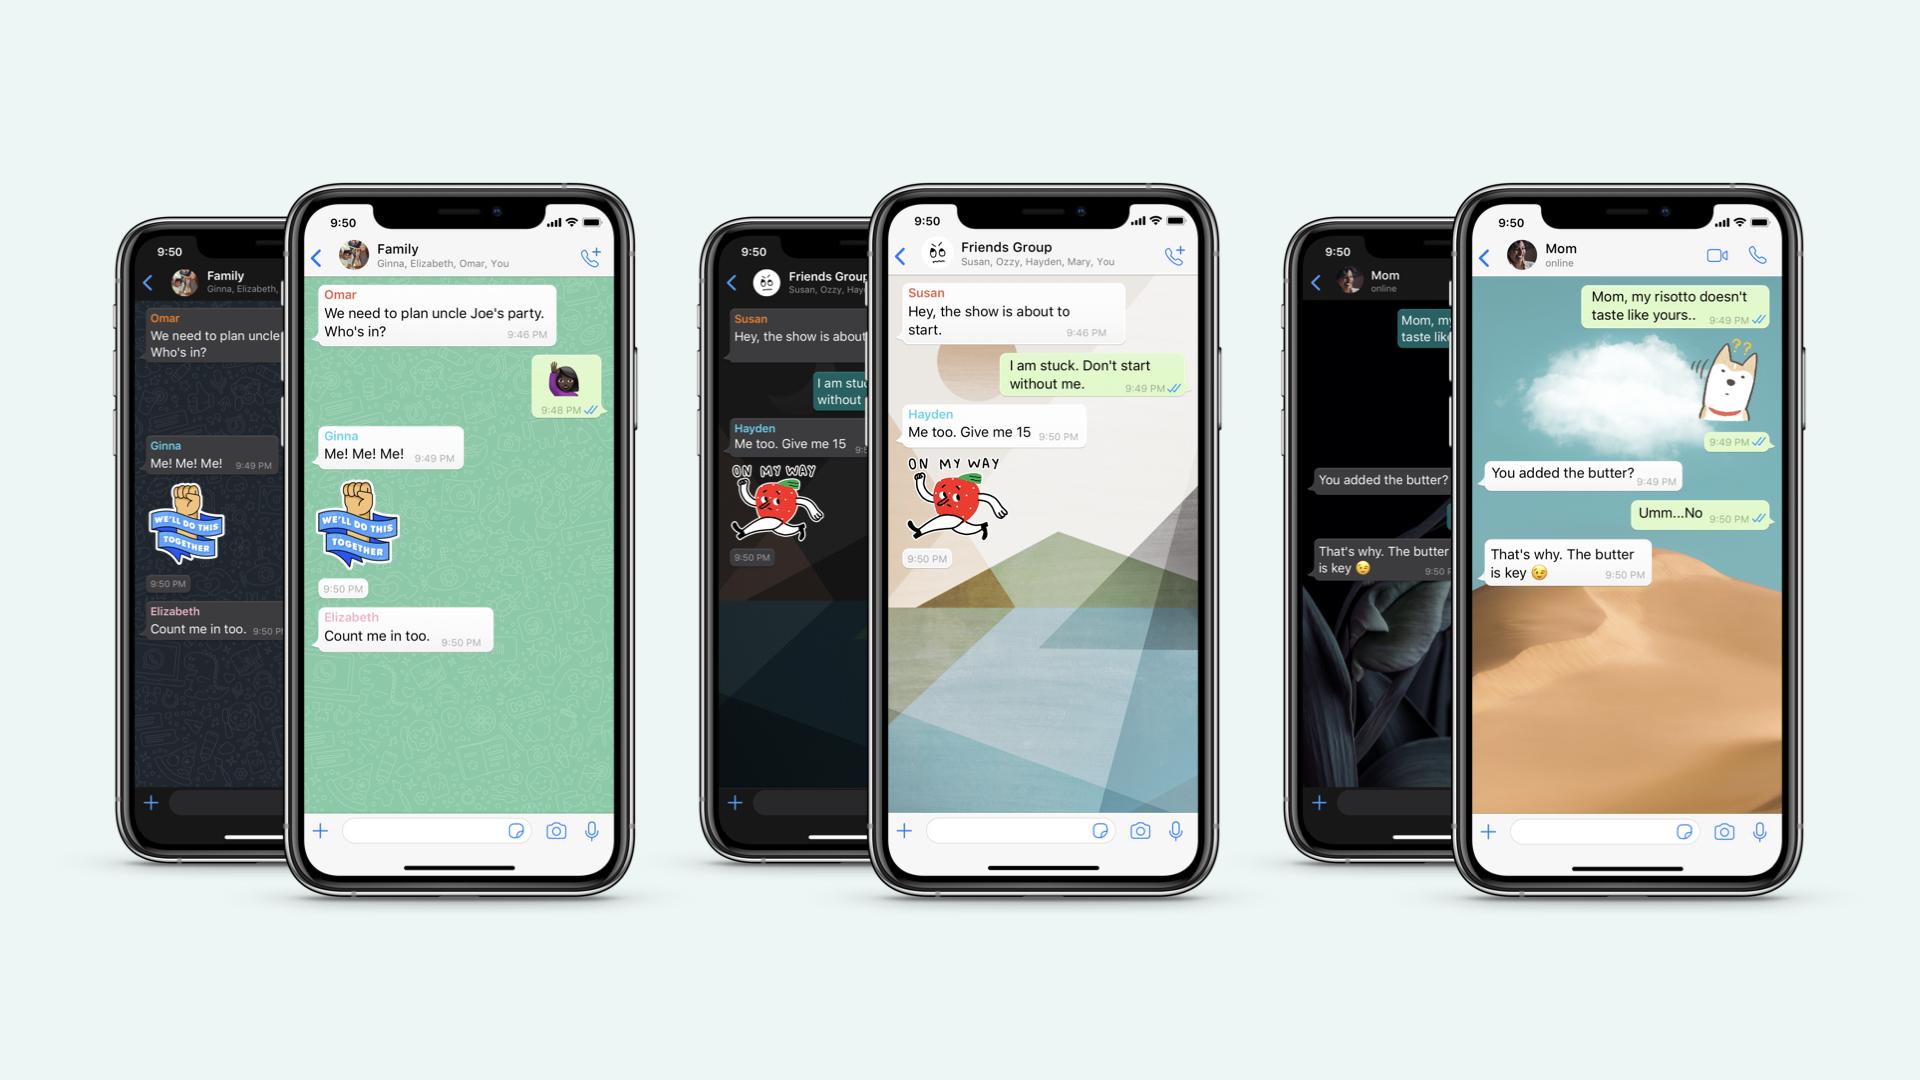 WhatsApp Wallpapers Groot